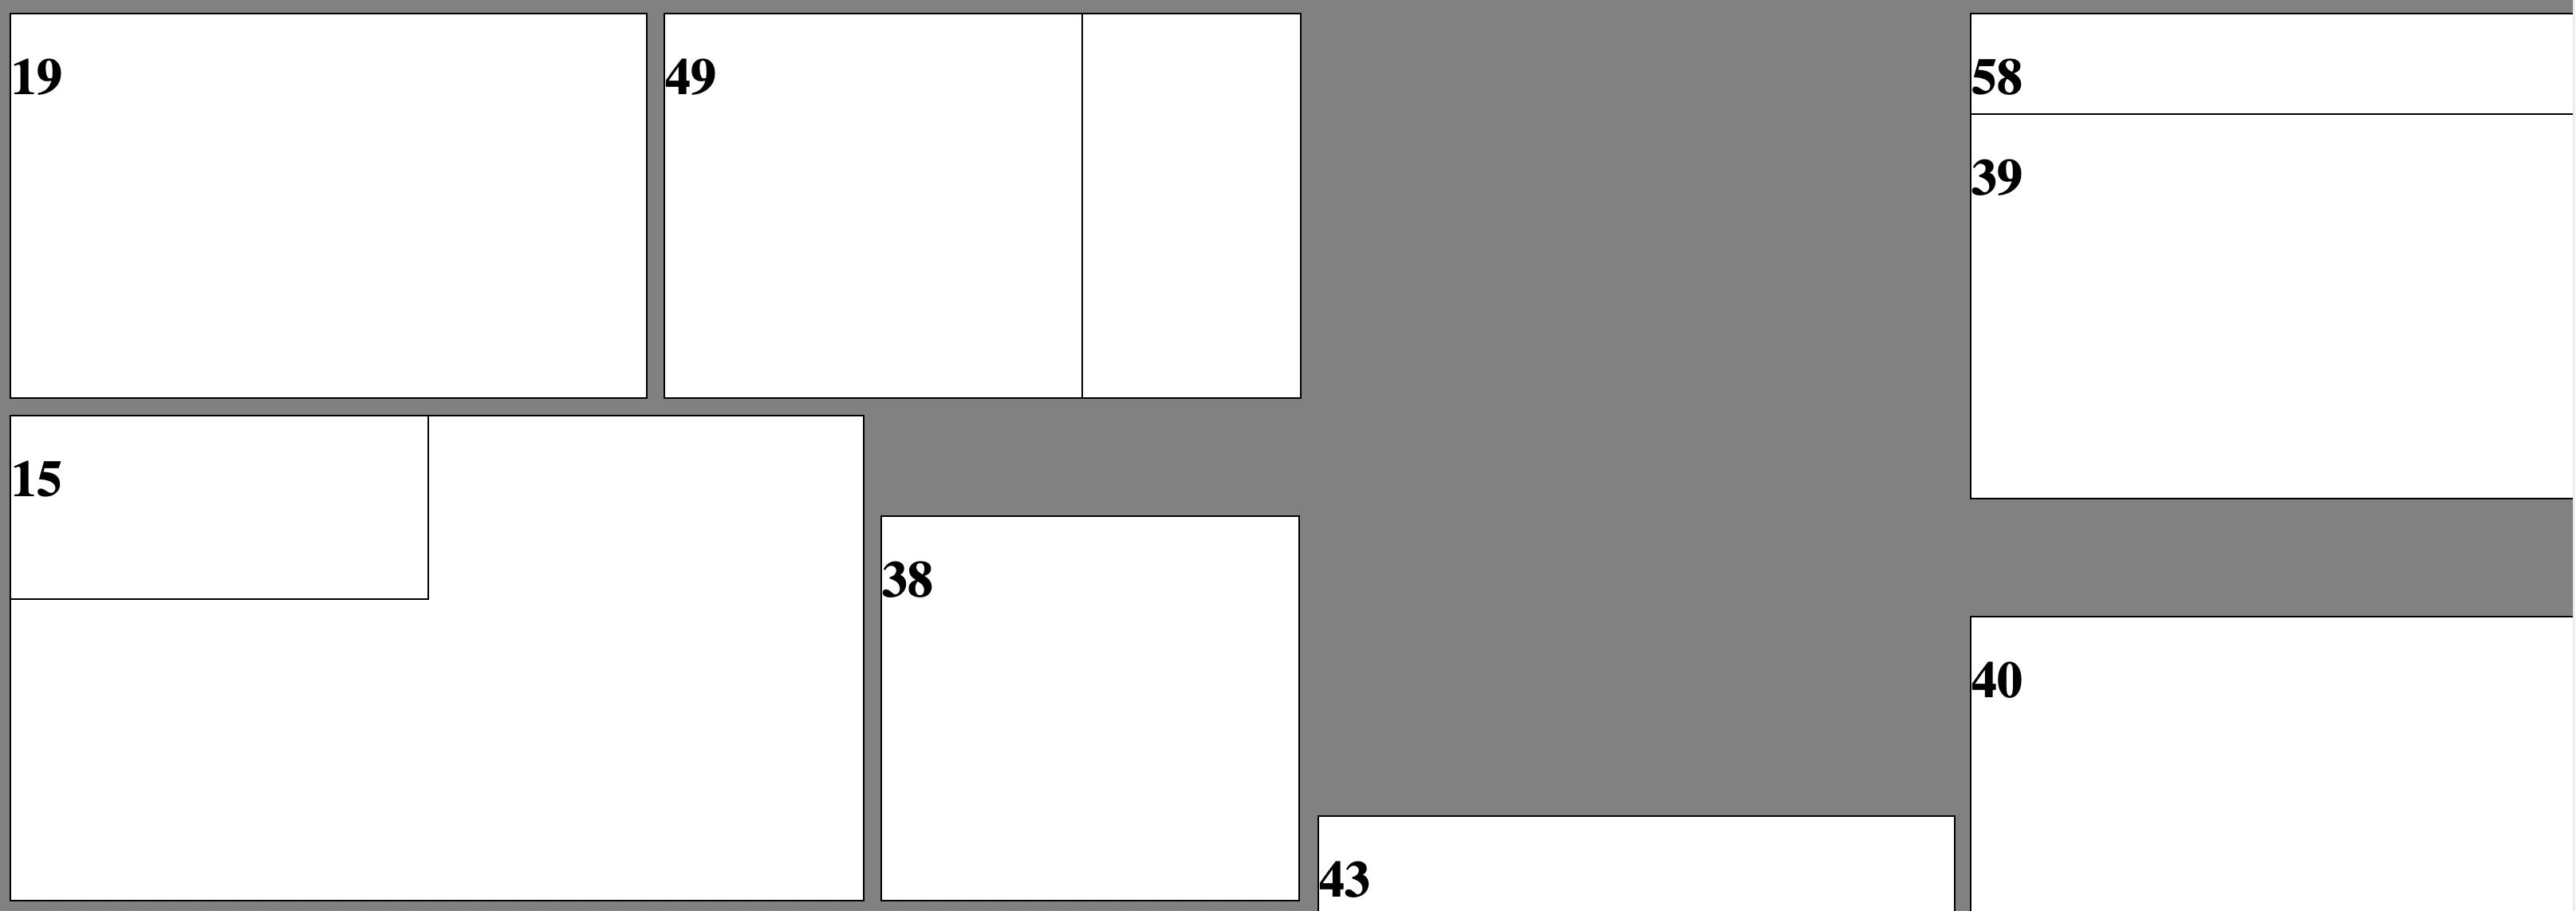 angular-gridster2 - Bountysource